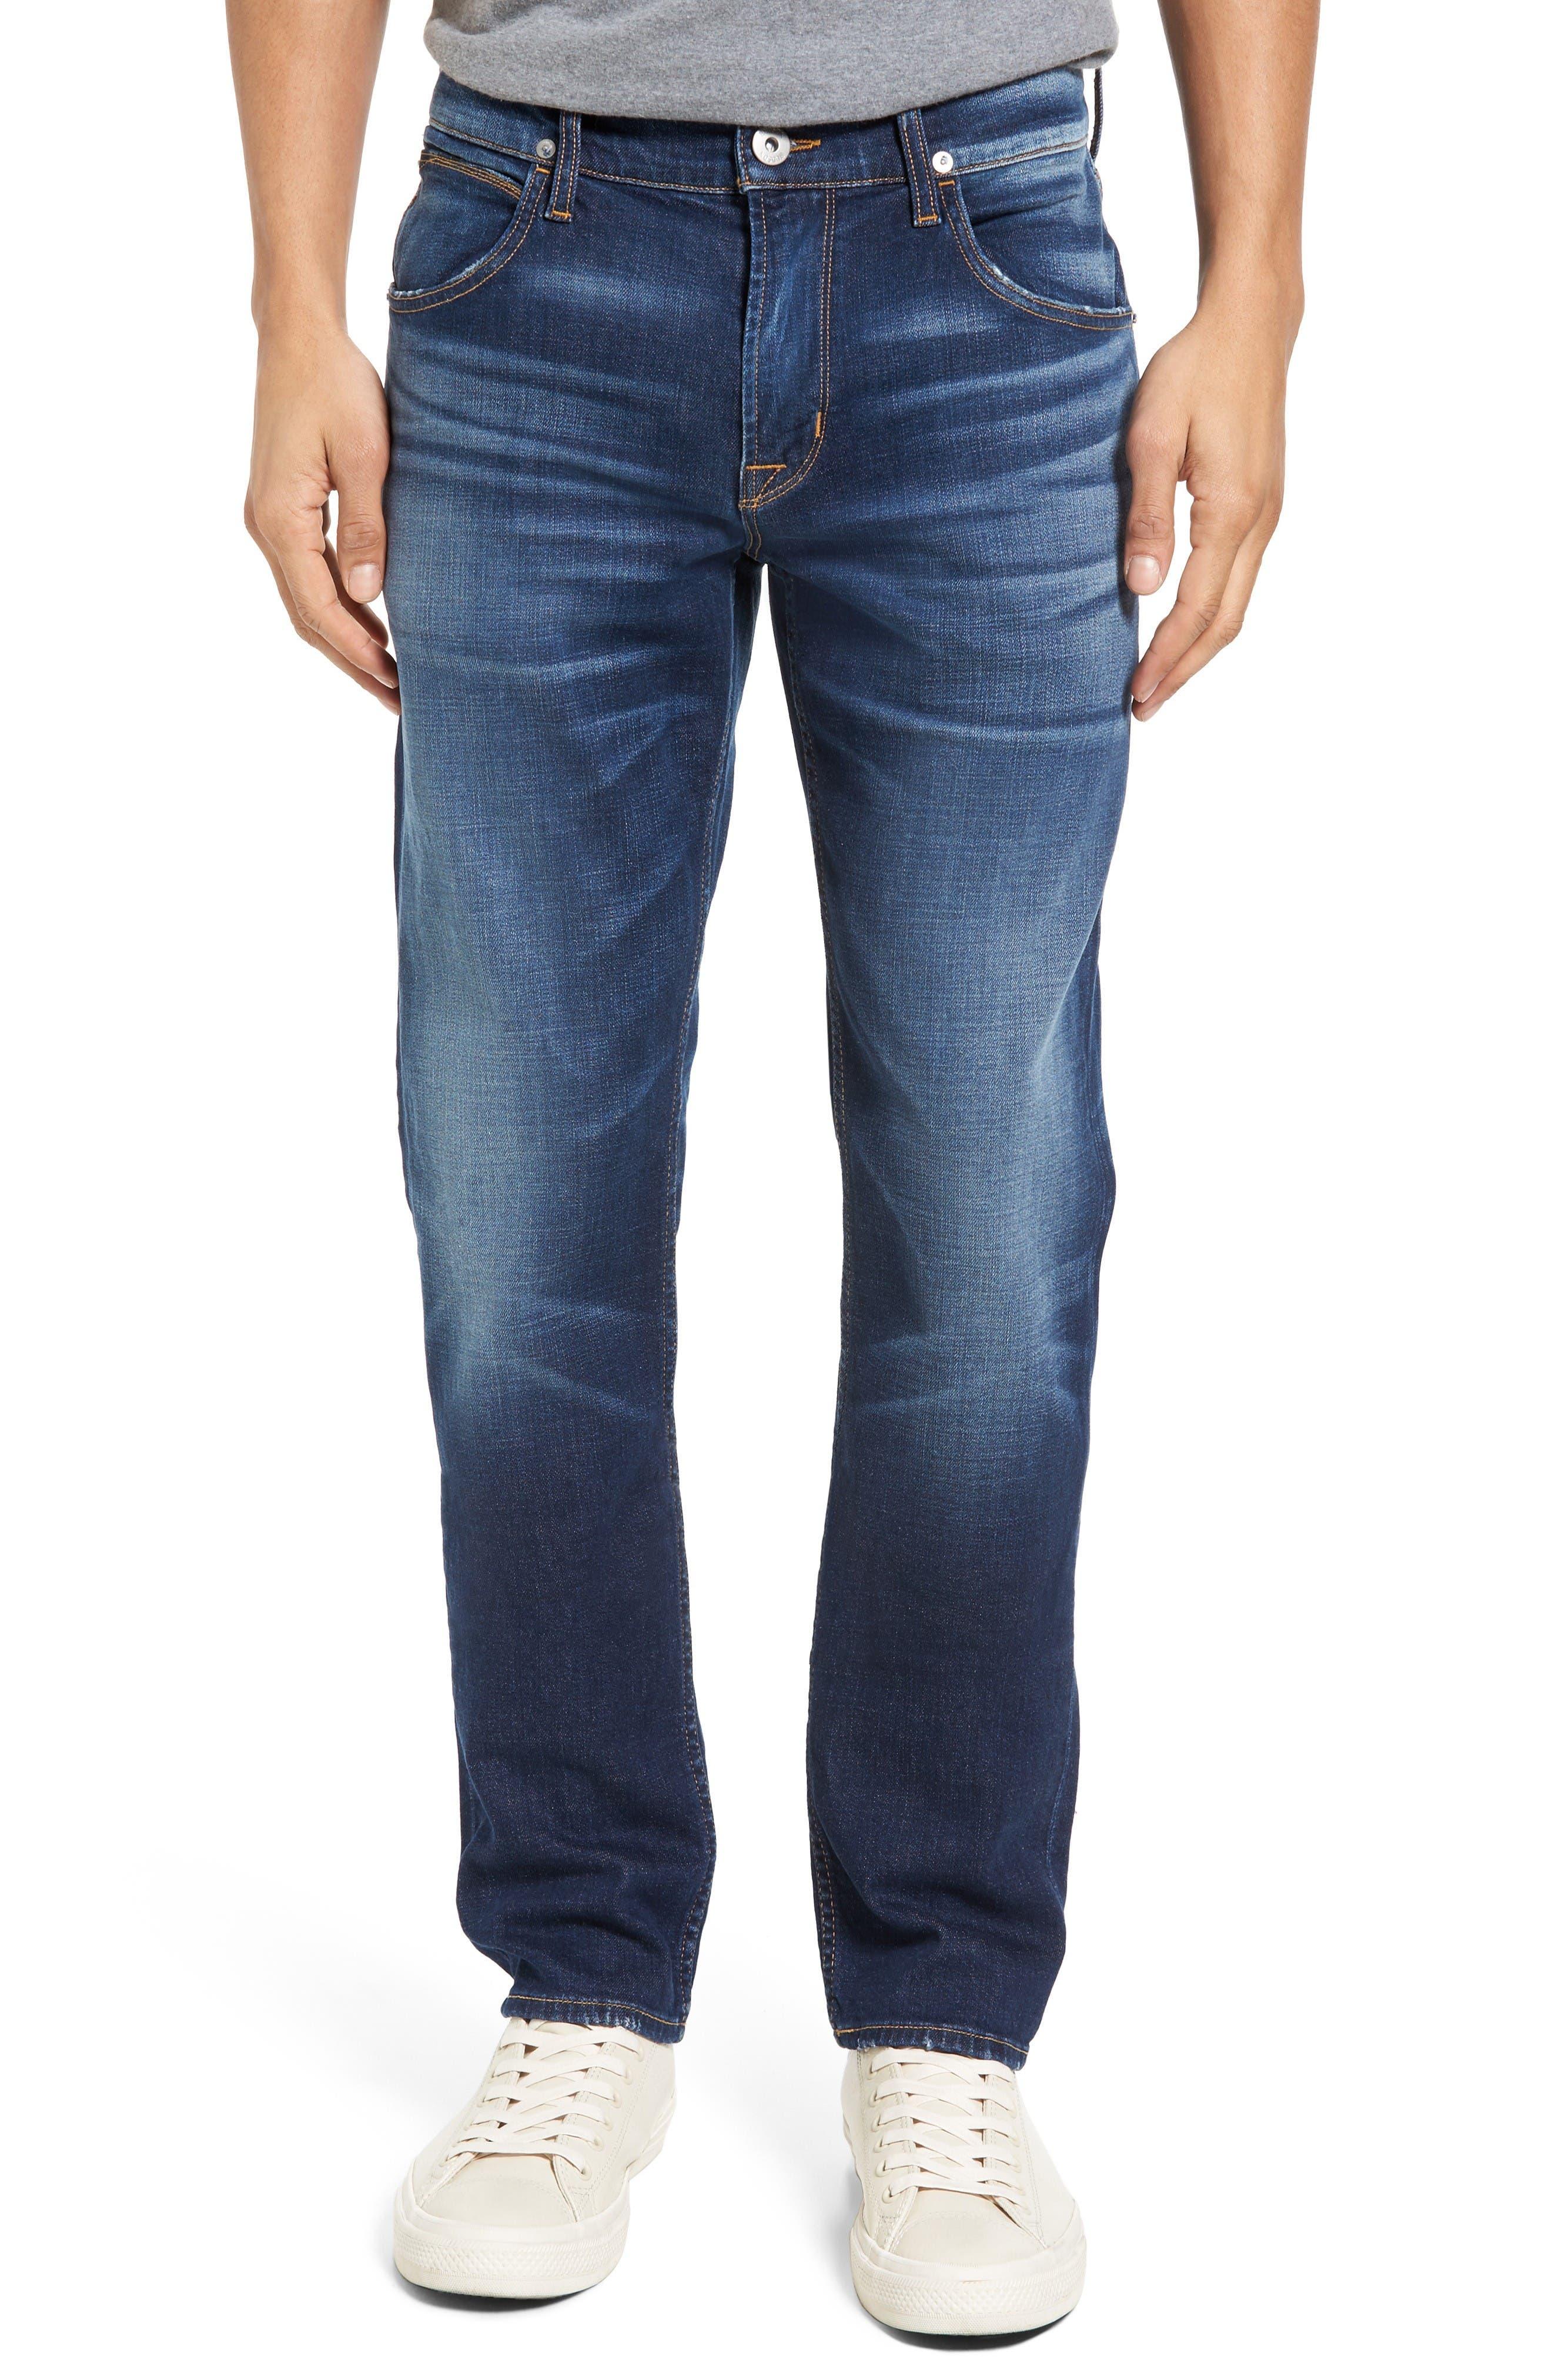 Blake Slim Fit Jeans,                             Main thumbnail 1, color,                             Genuine